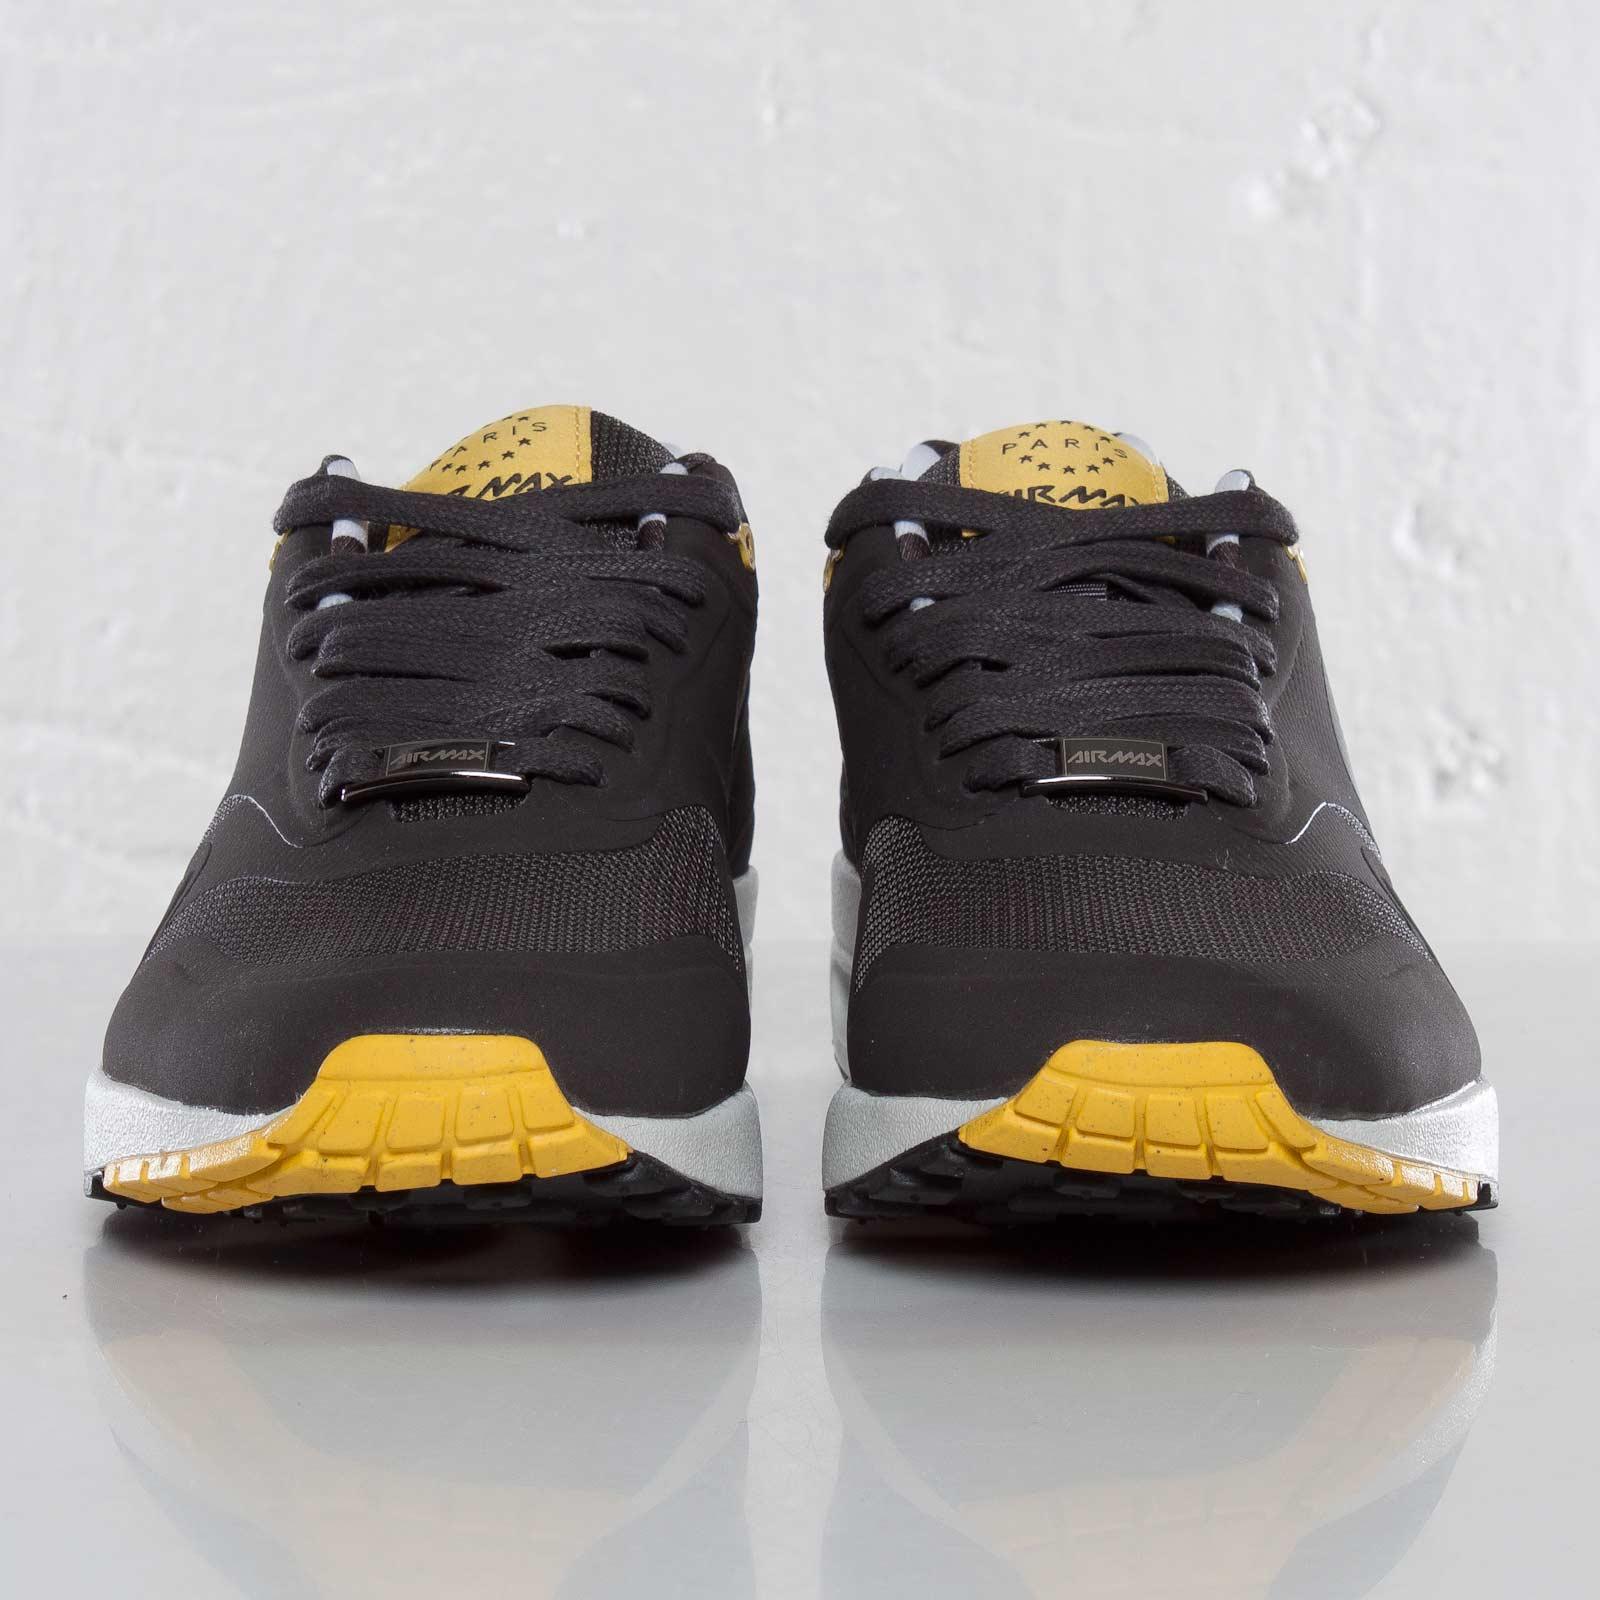 separation shoes 5f718 1939a Nike Air Max 1 Paris QS - 587923-001 - Sneakersnstuff   sneakers    streetwear online since 1999